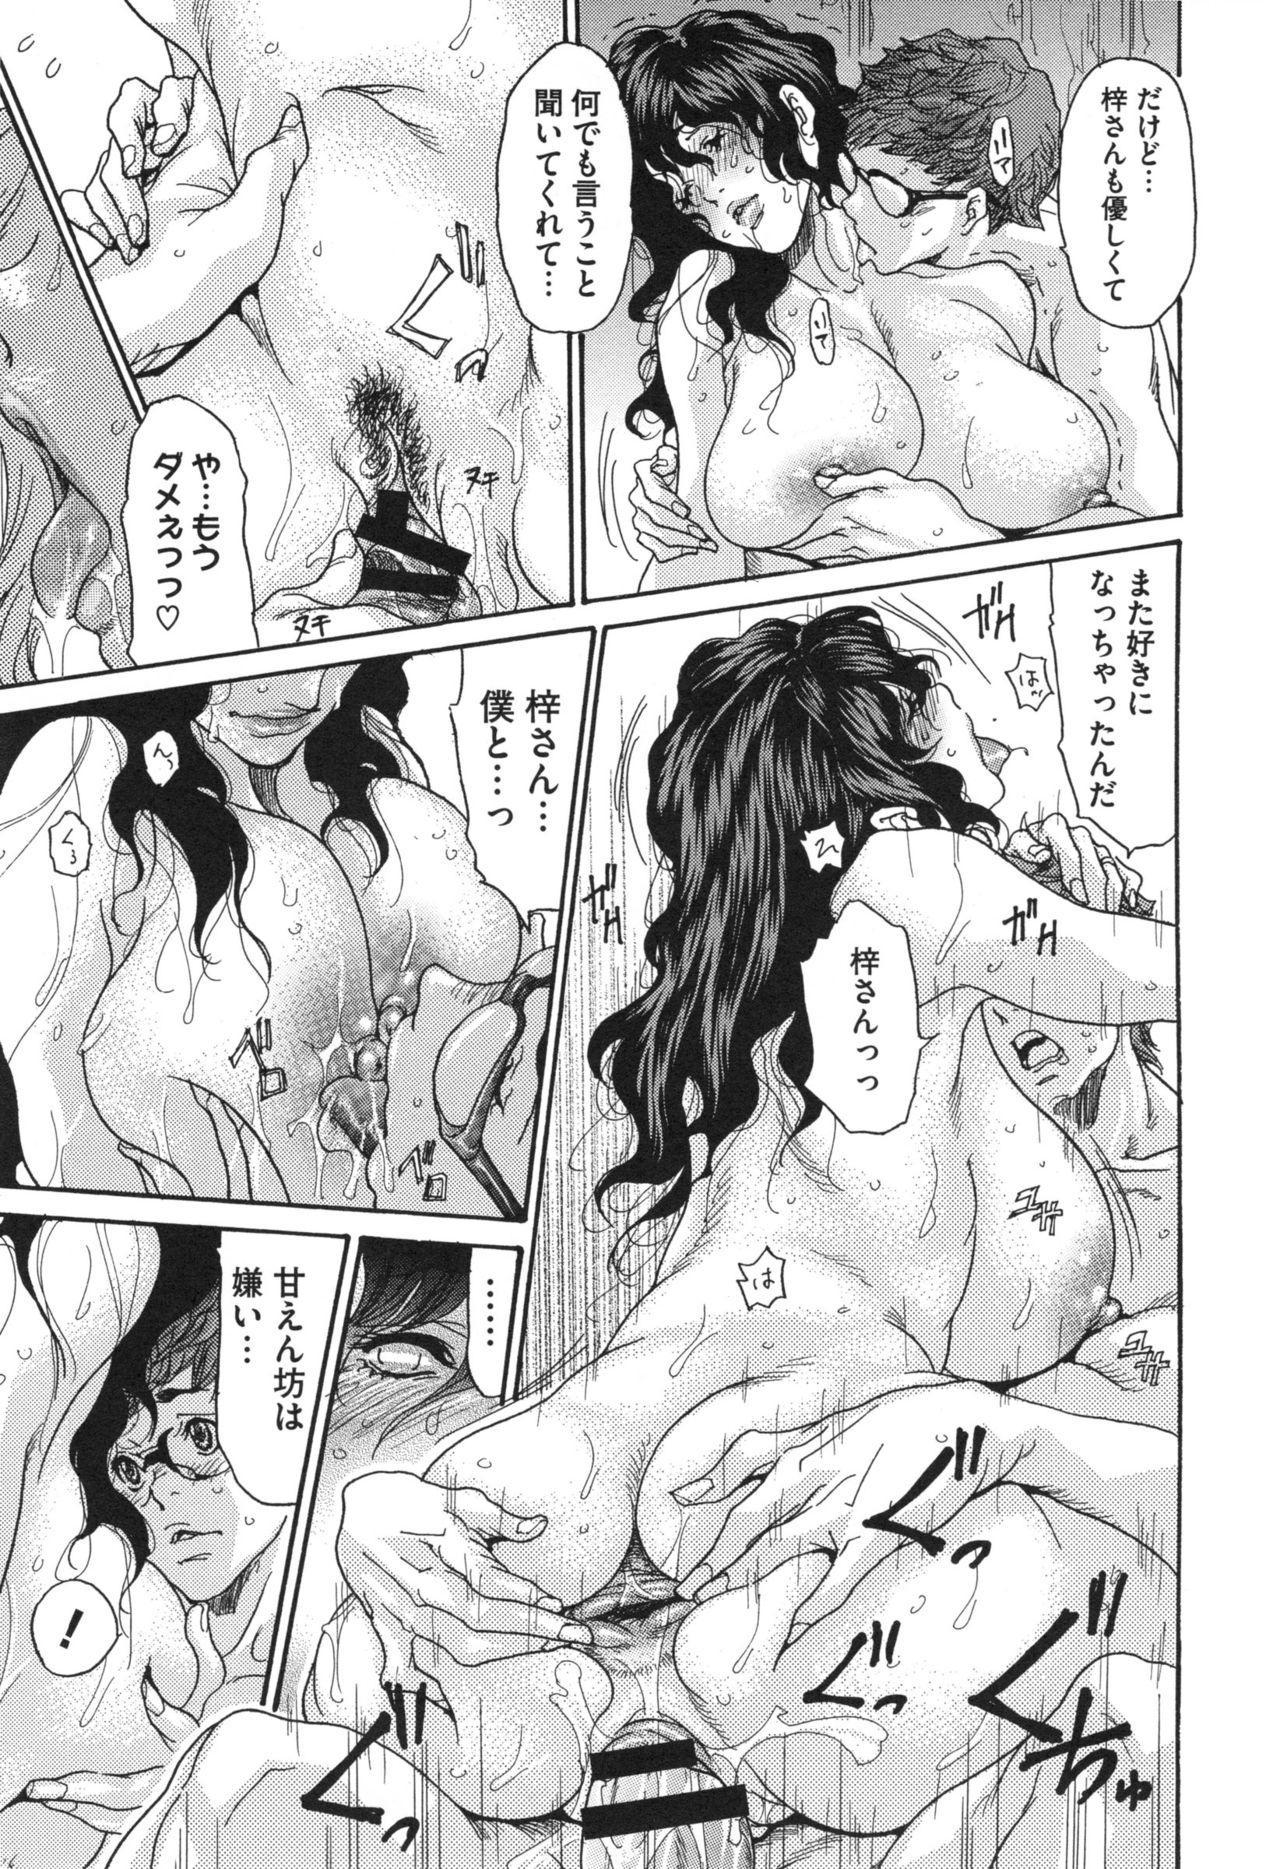 Niku-zuma Netorare Maniacs 125